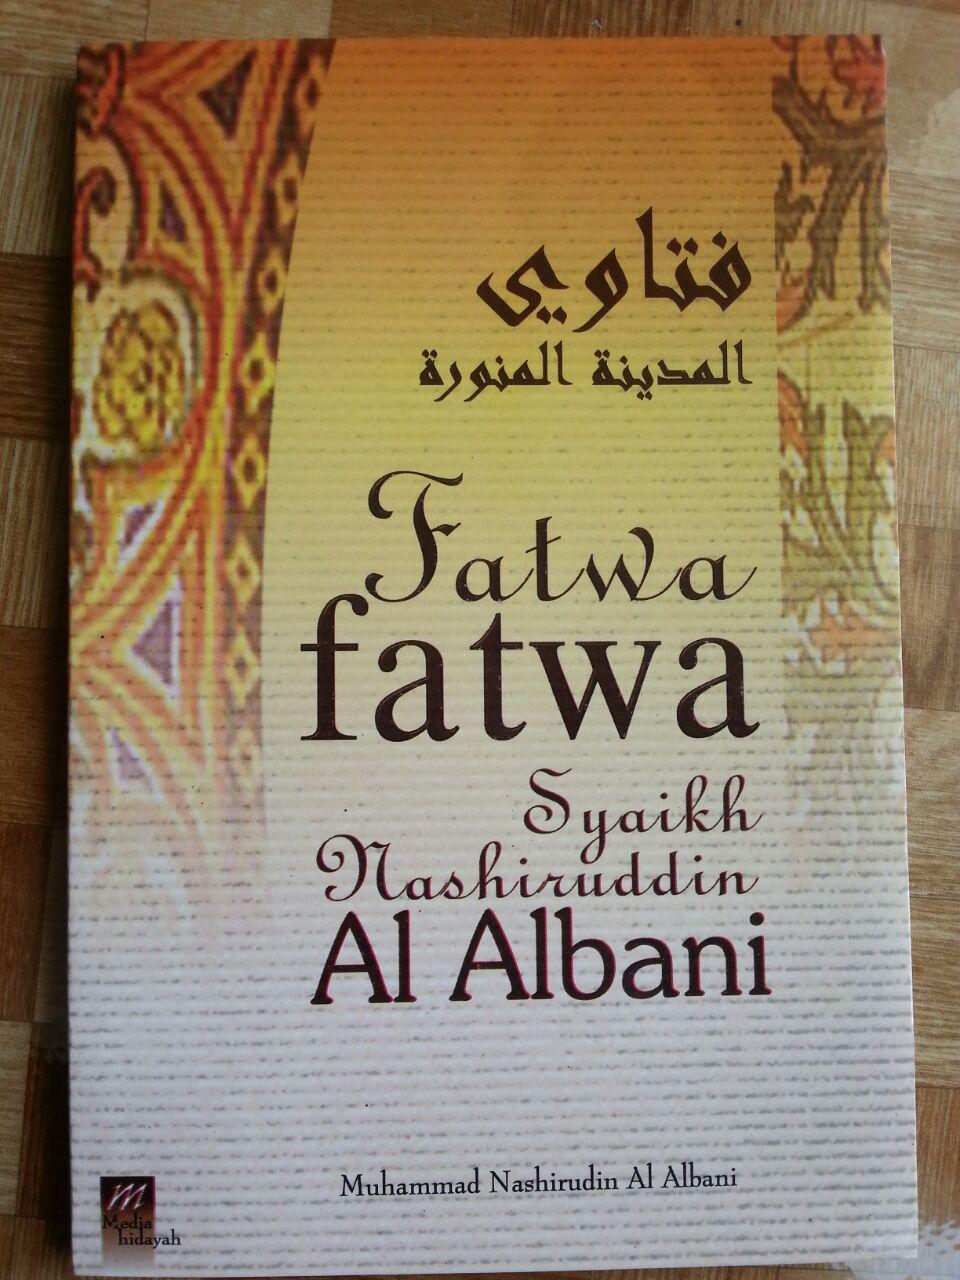 Fatwa-fatwa Syaikh Muhammad Nashiruddin al-Albani cover 2